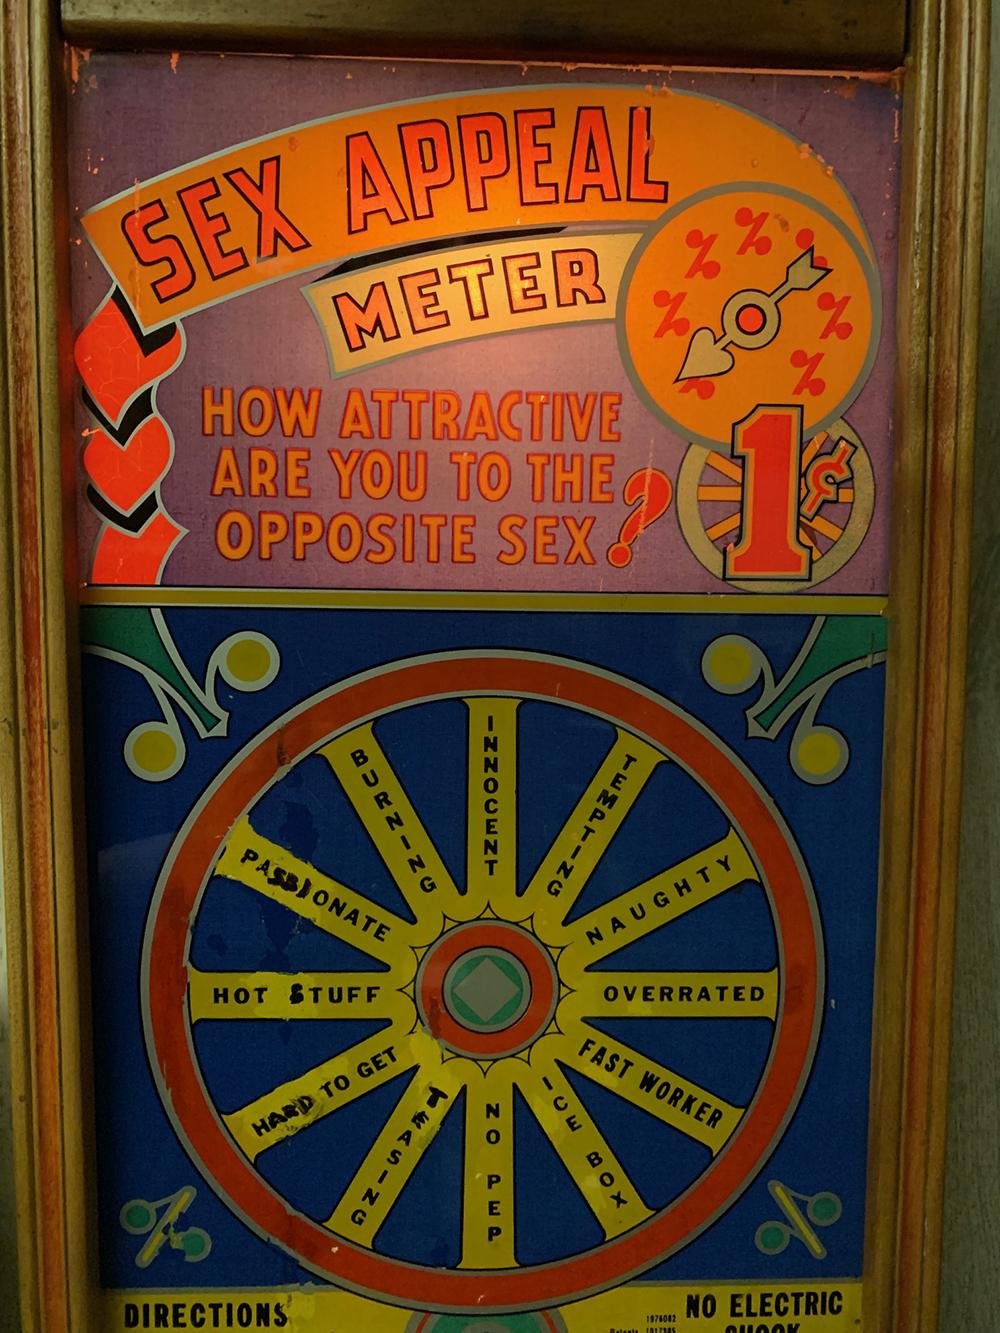 Lot 164: Vintage Sex Appeal Strength Arcade Game